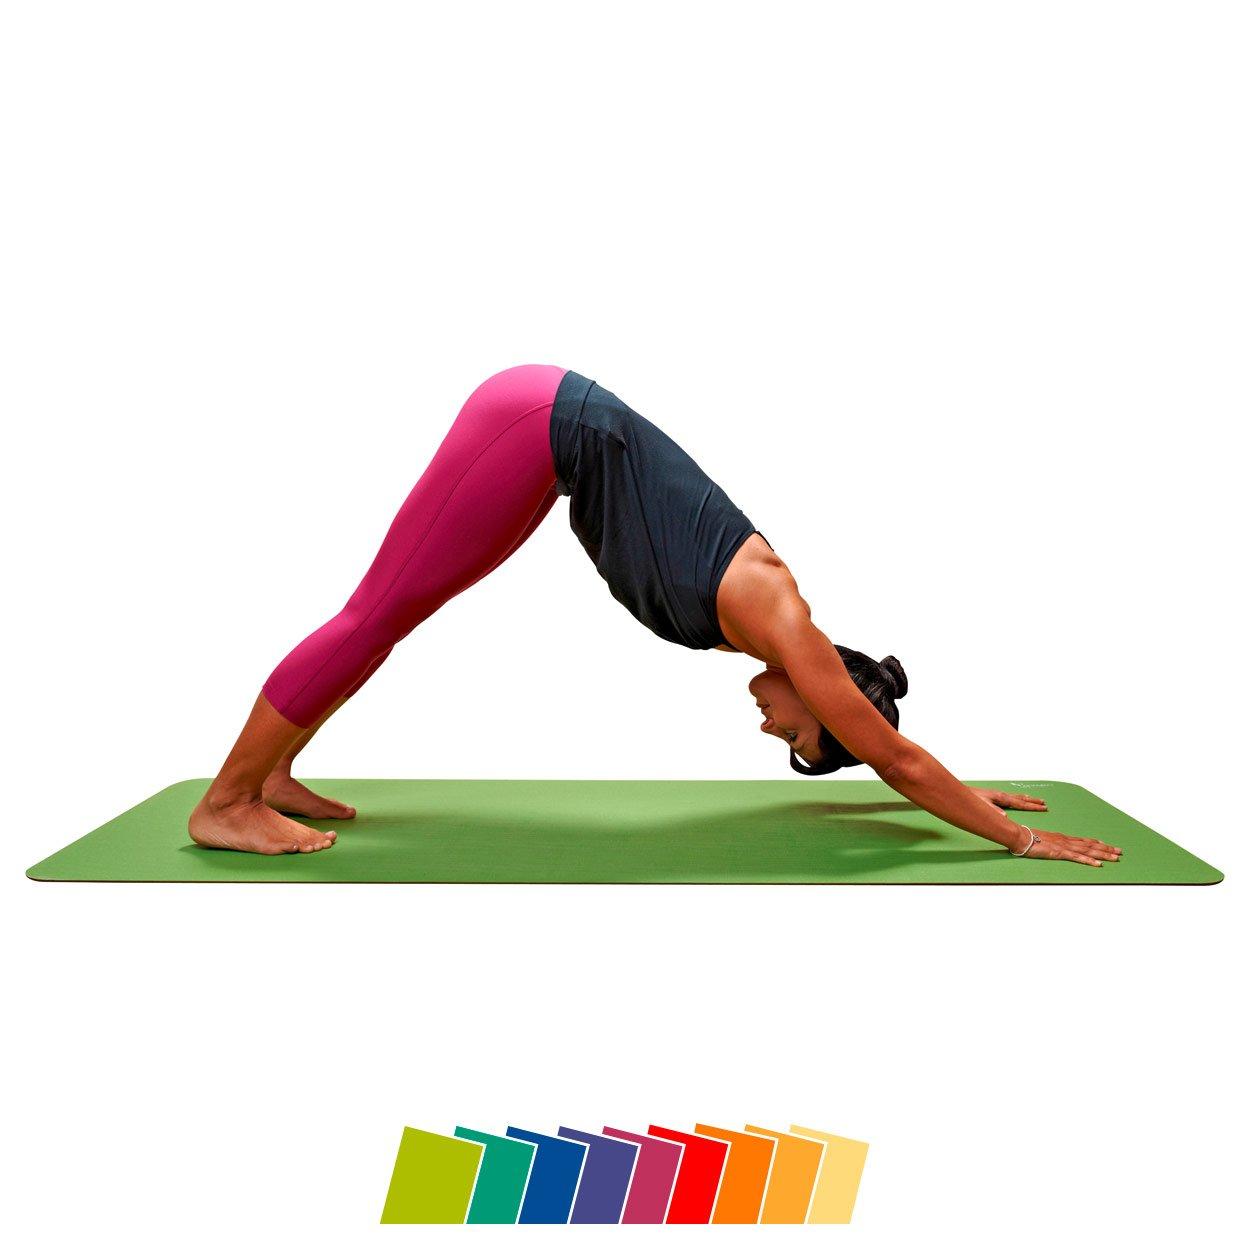 CALYANA tapis aIREX prime, tapis dexercices spécial pilates ...